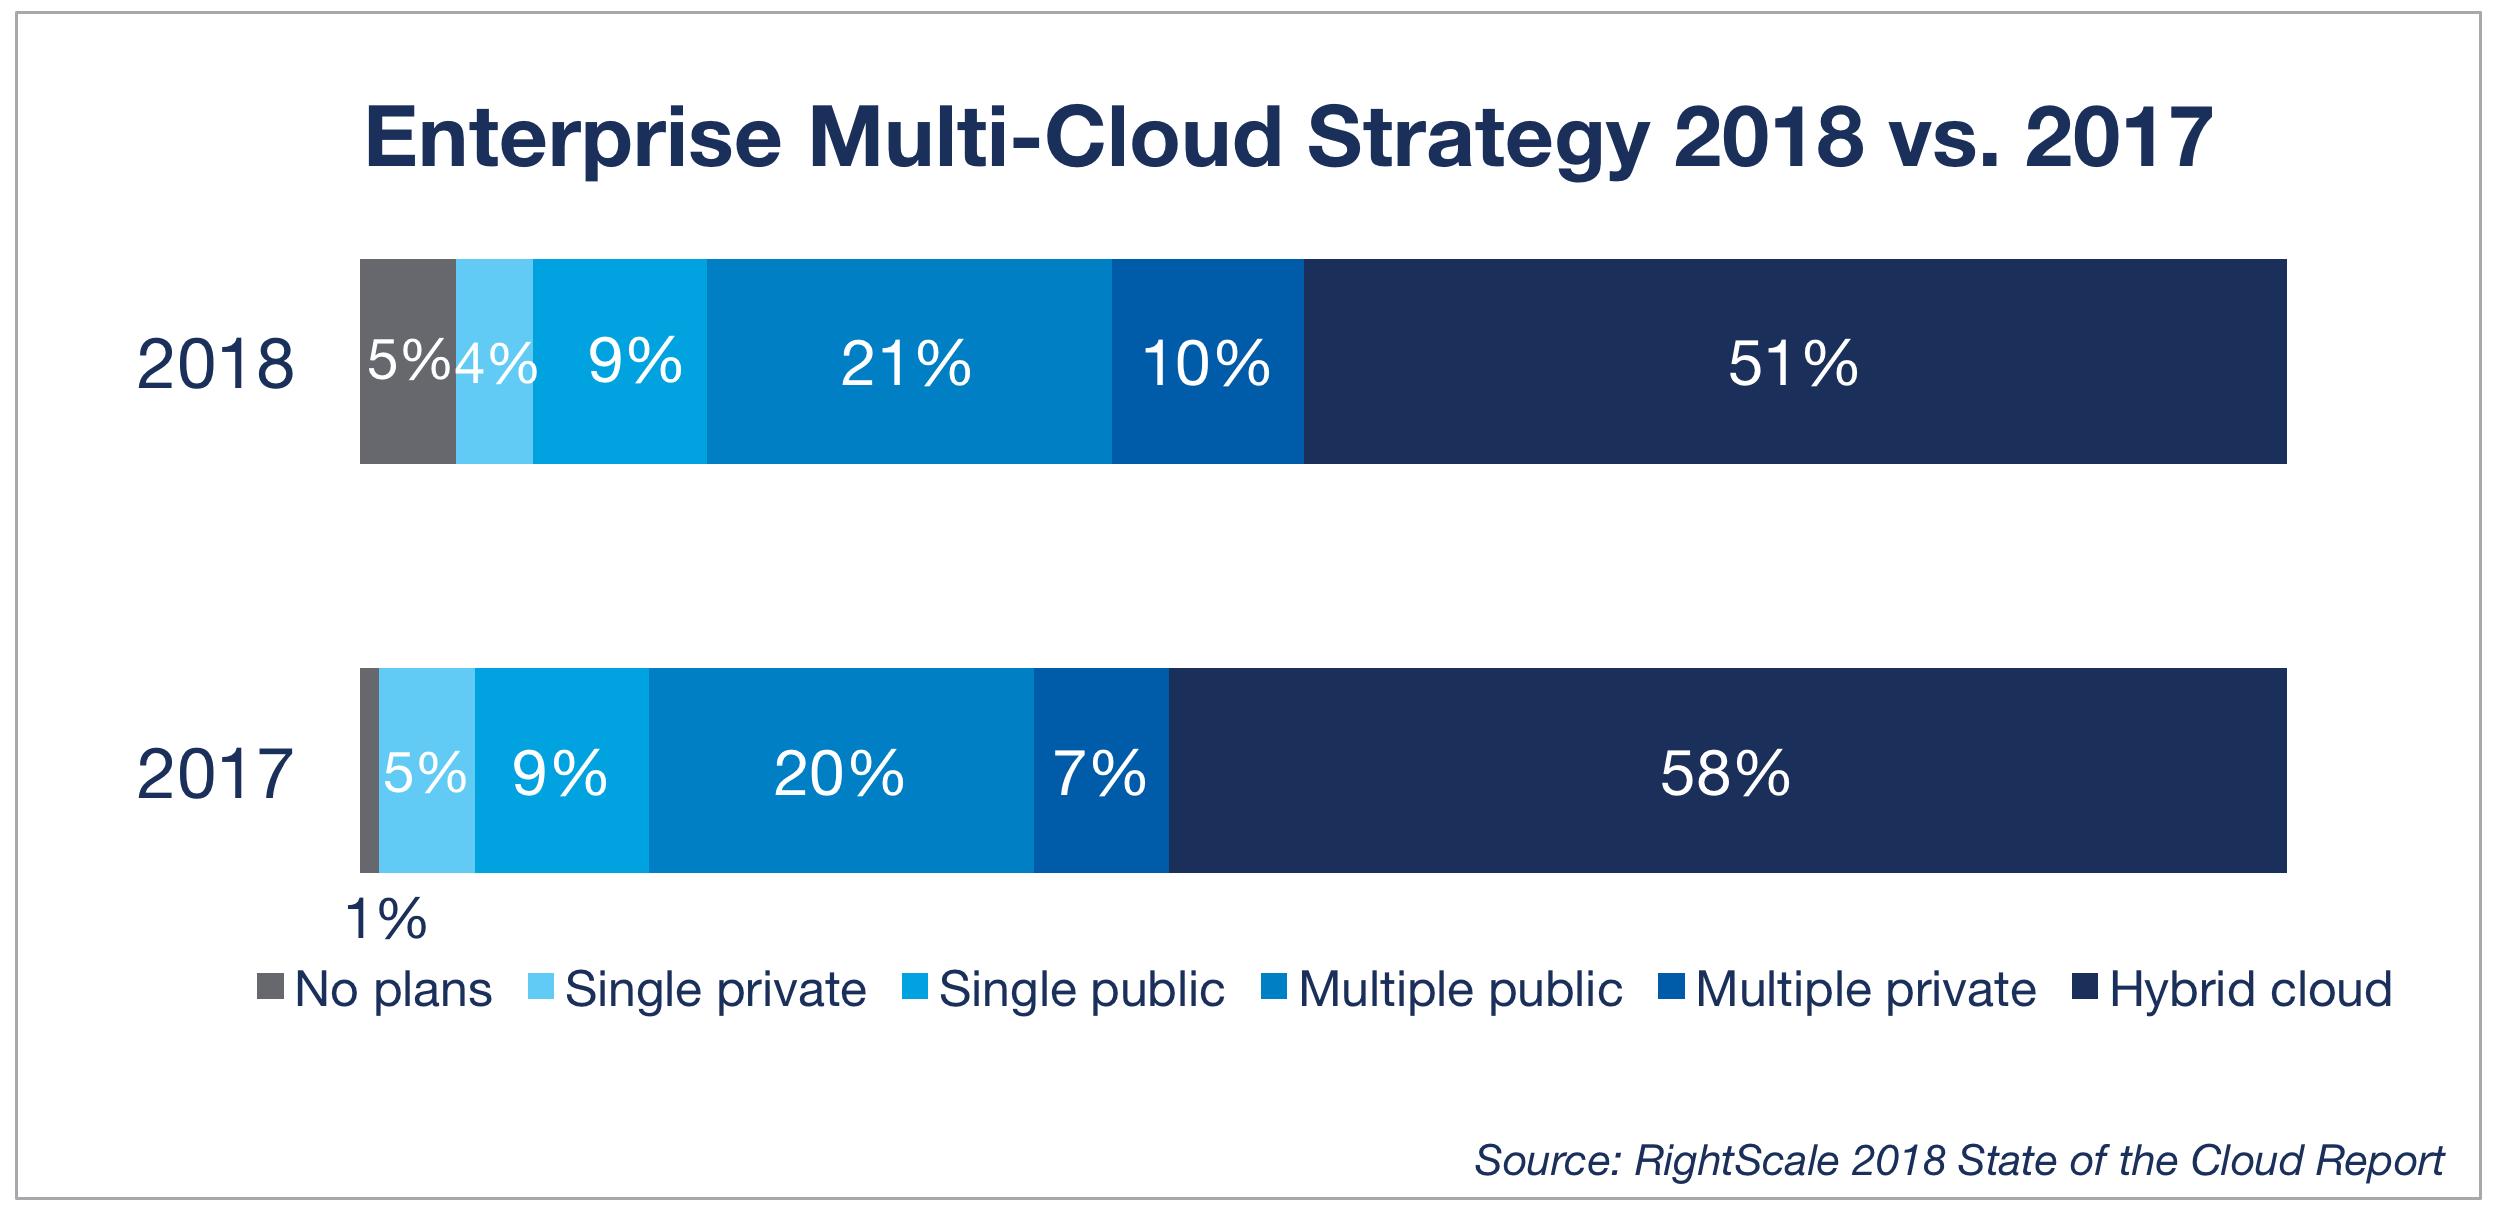 Enterprise Multi-Cloud Strategy 2018 vs. 2017